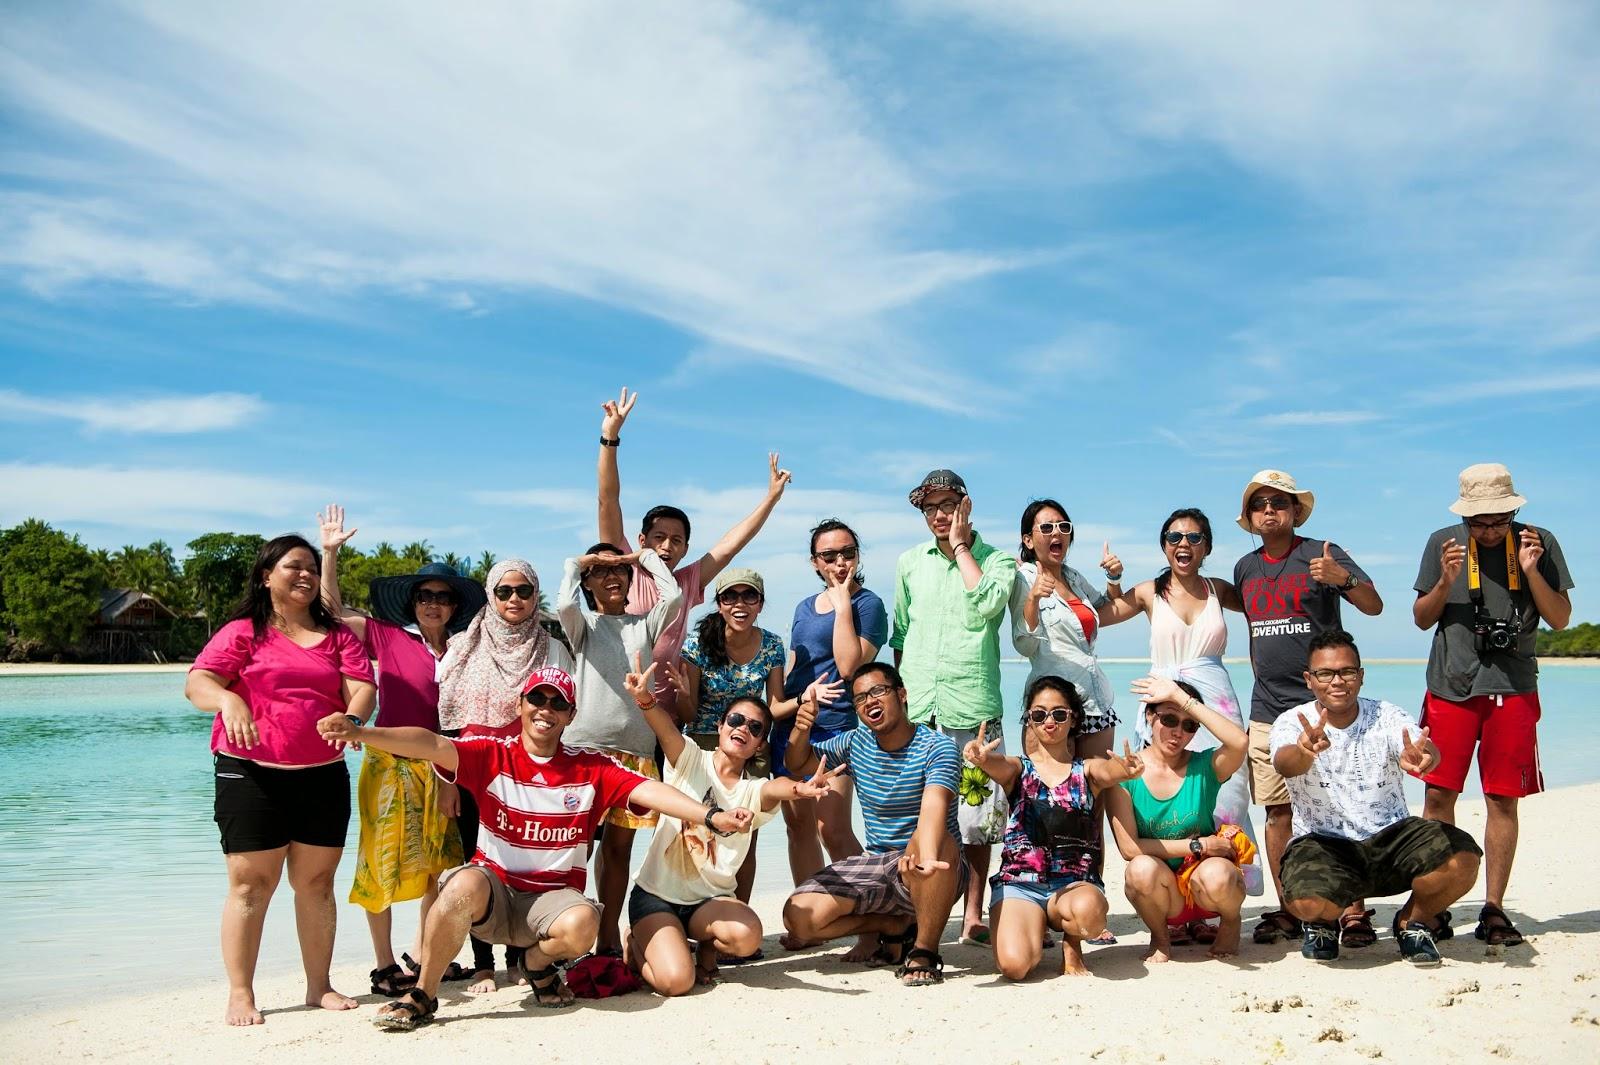 Go holiday | five fun ways | 41studioruby on rails company